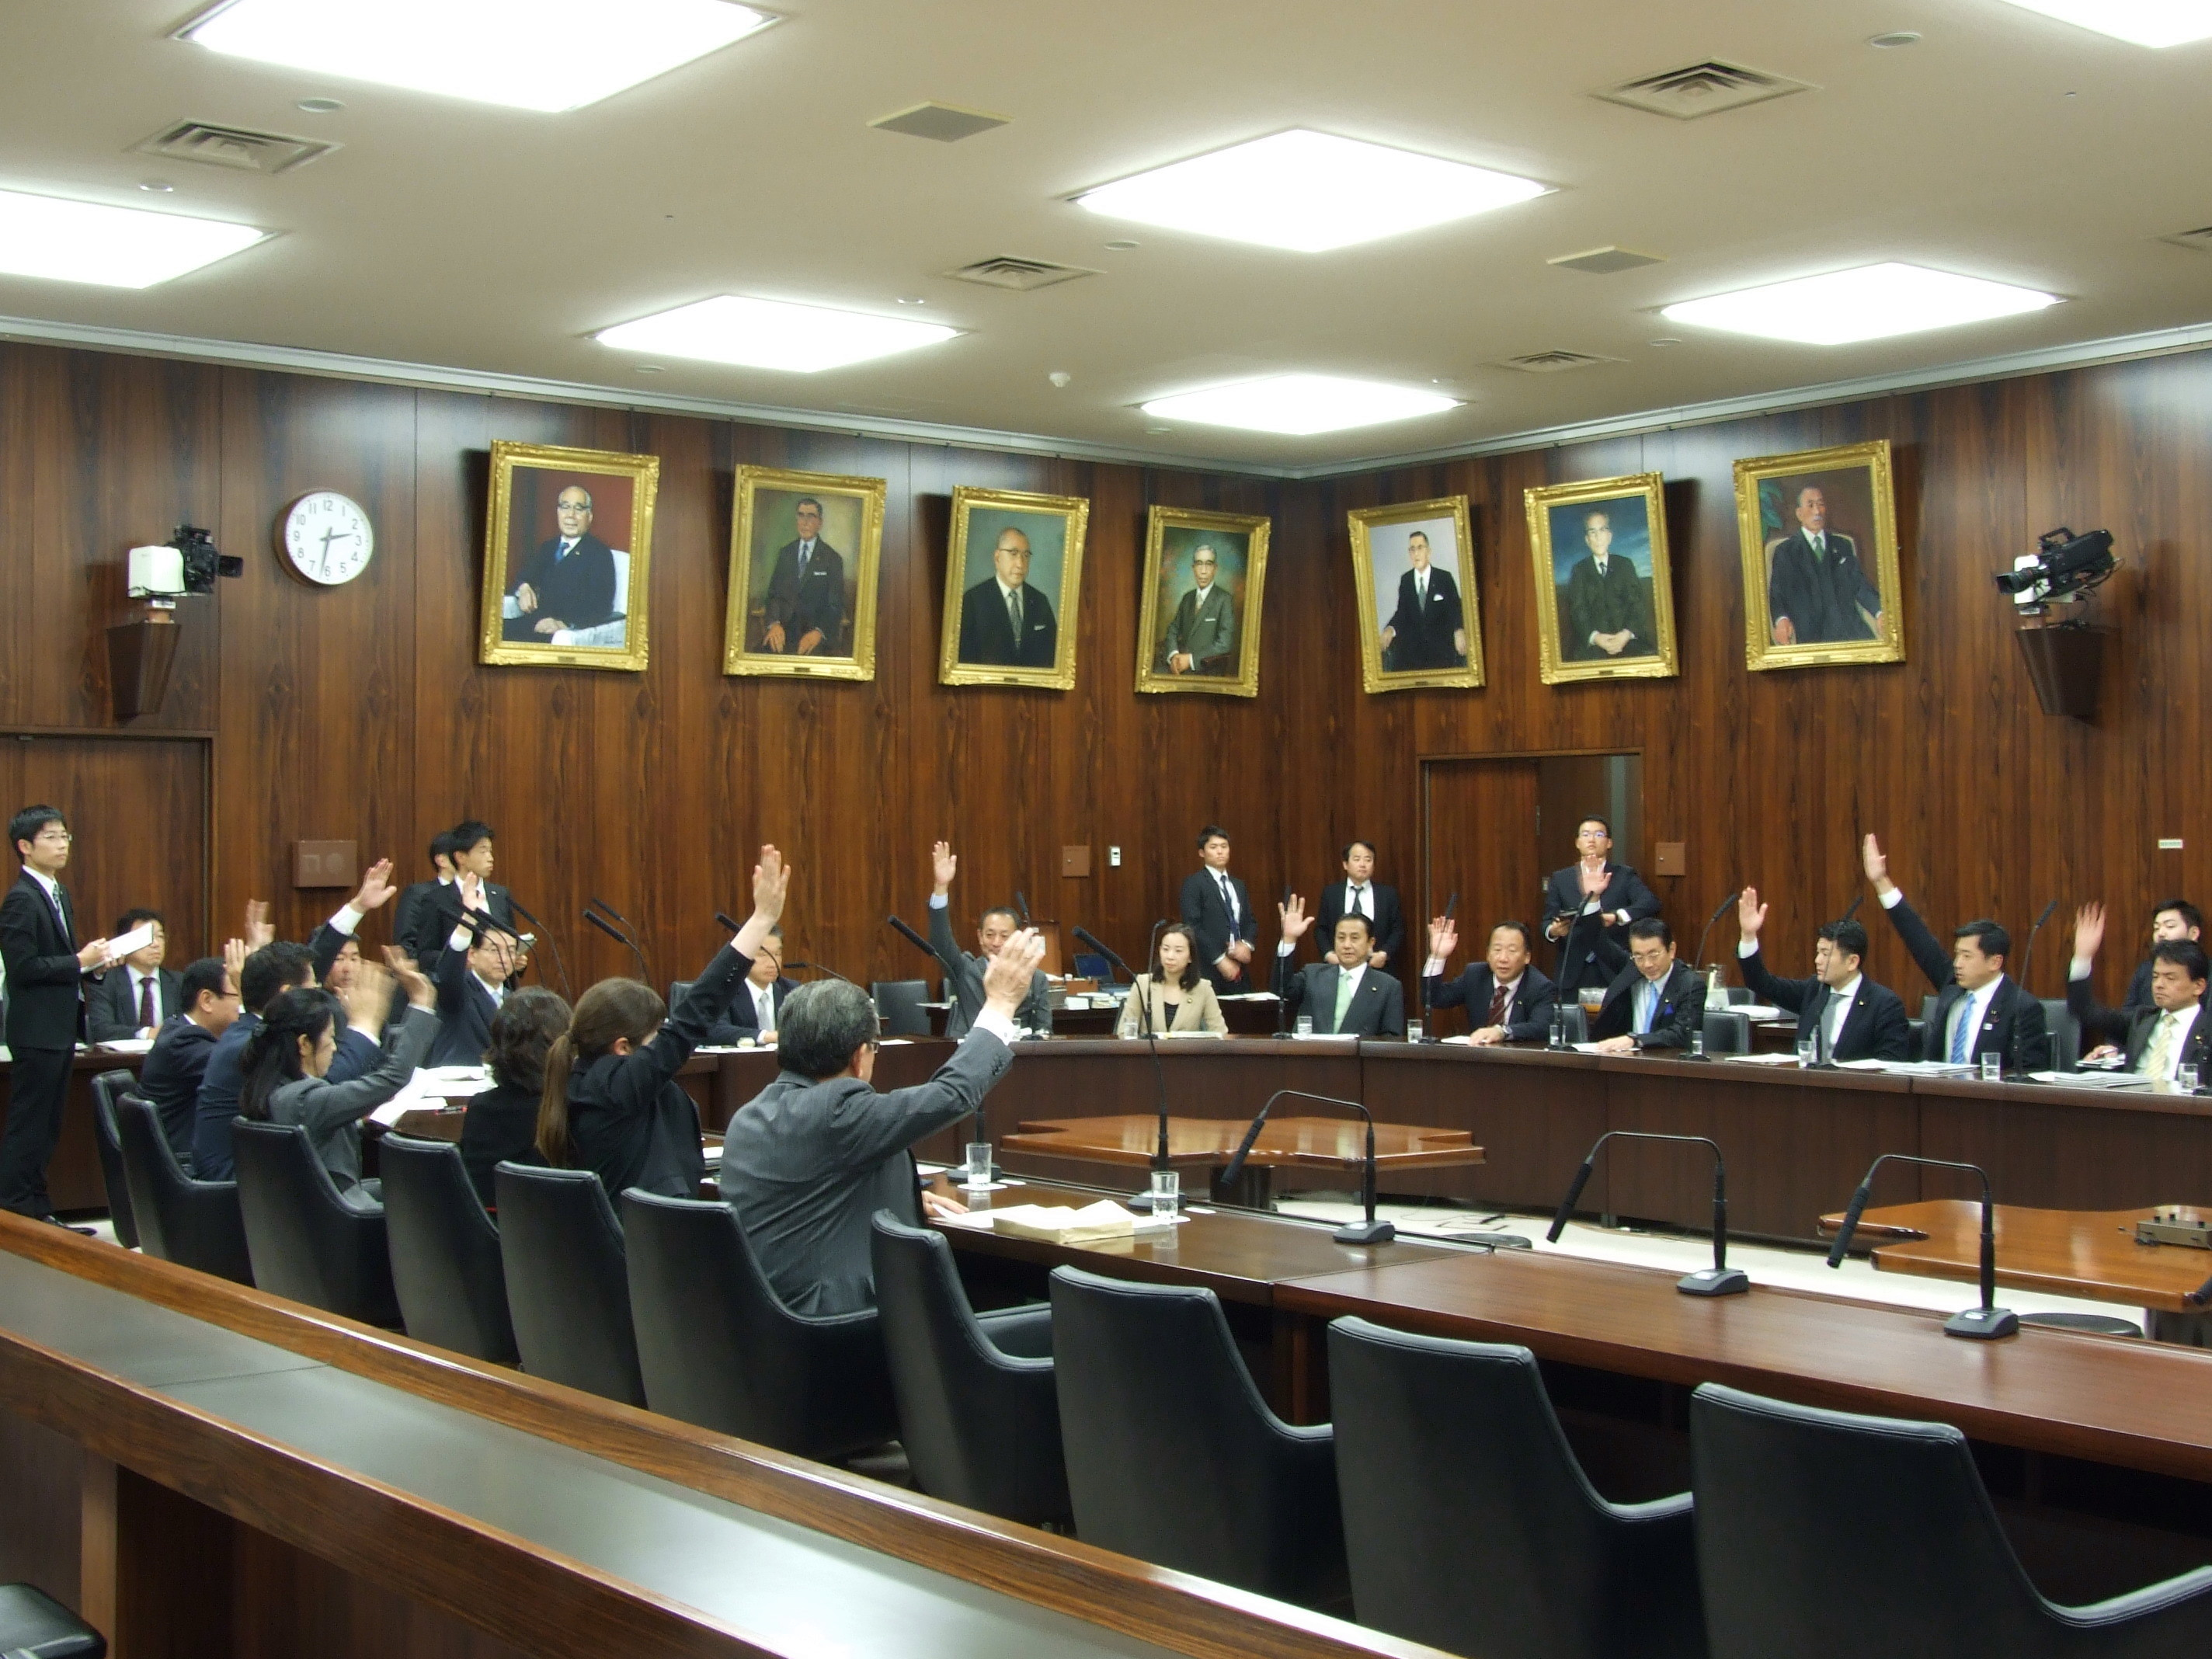 文教科学委員会、教育公務員特例法等の一部を改正する法律案可決